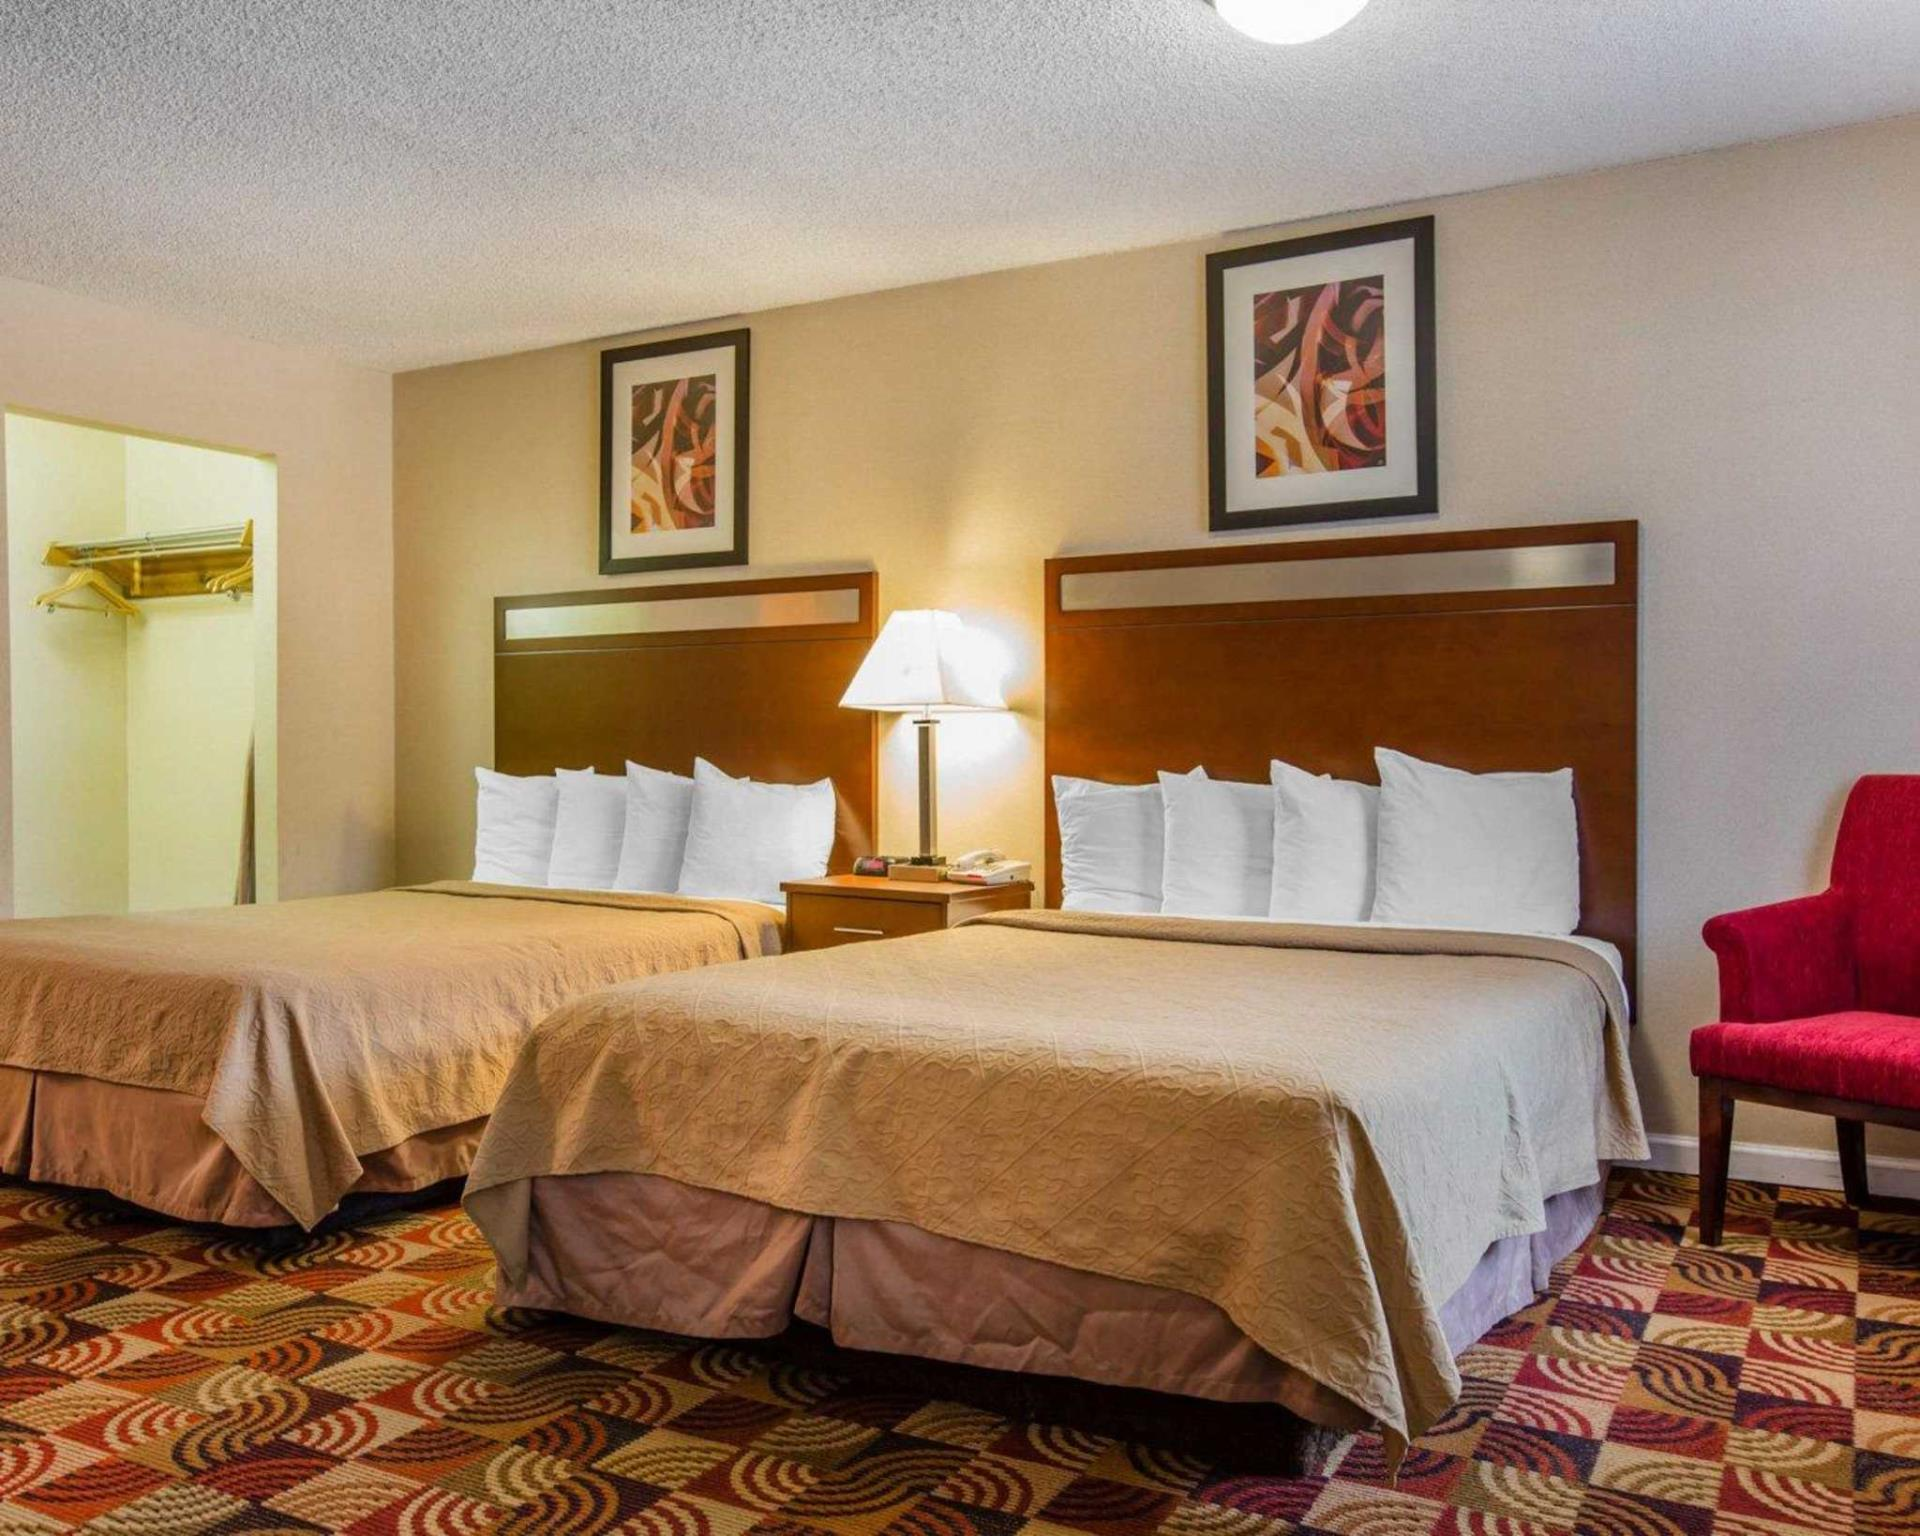 Best Price on Quality Inn in Redding (CA) + Reviews!